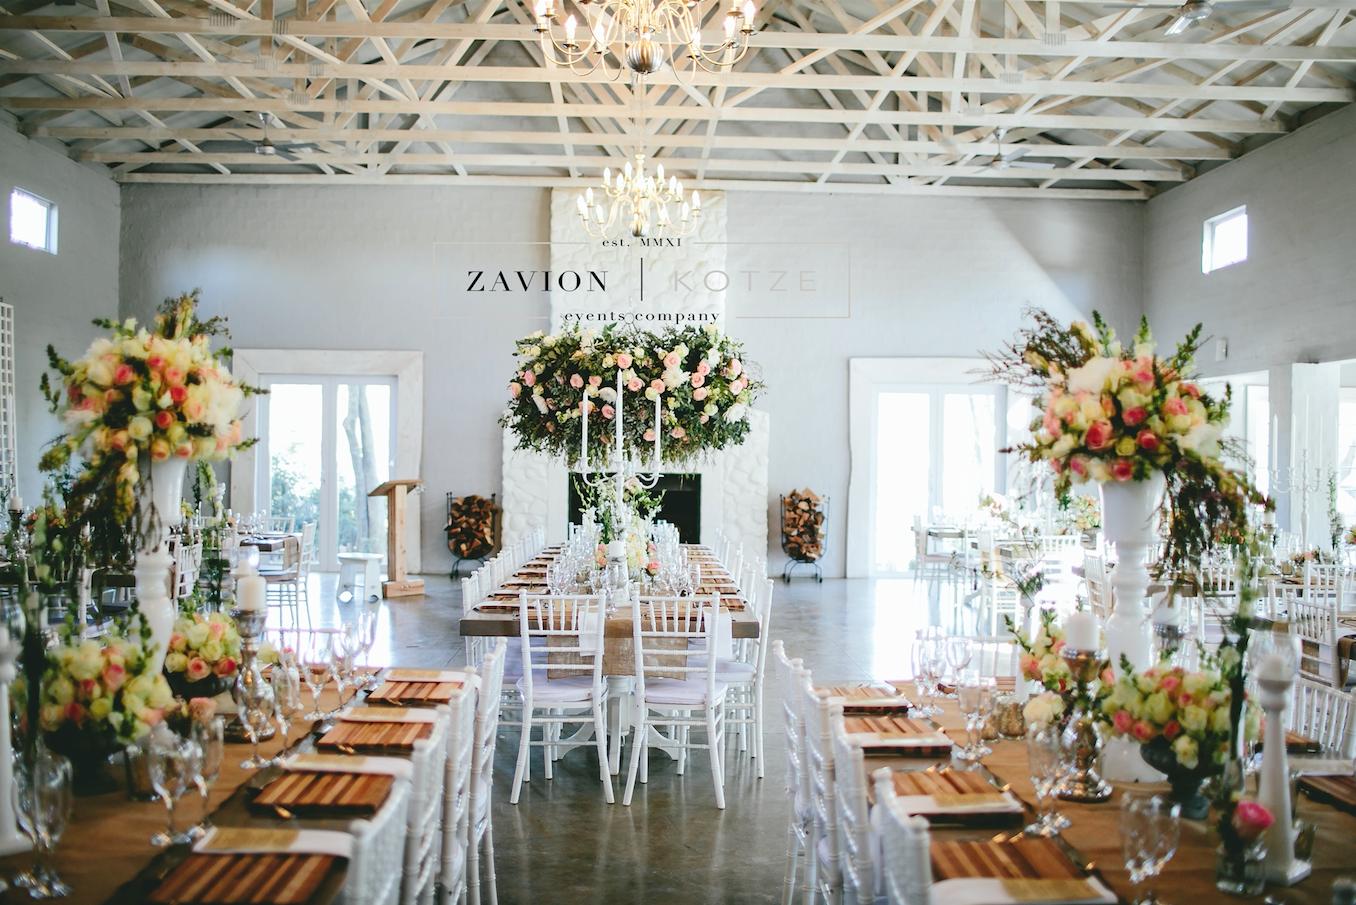 Beautiful wooden tables, tiffany chairs, elegant wedding ...